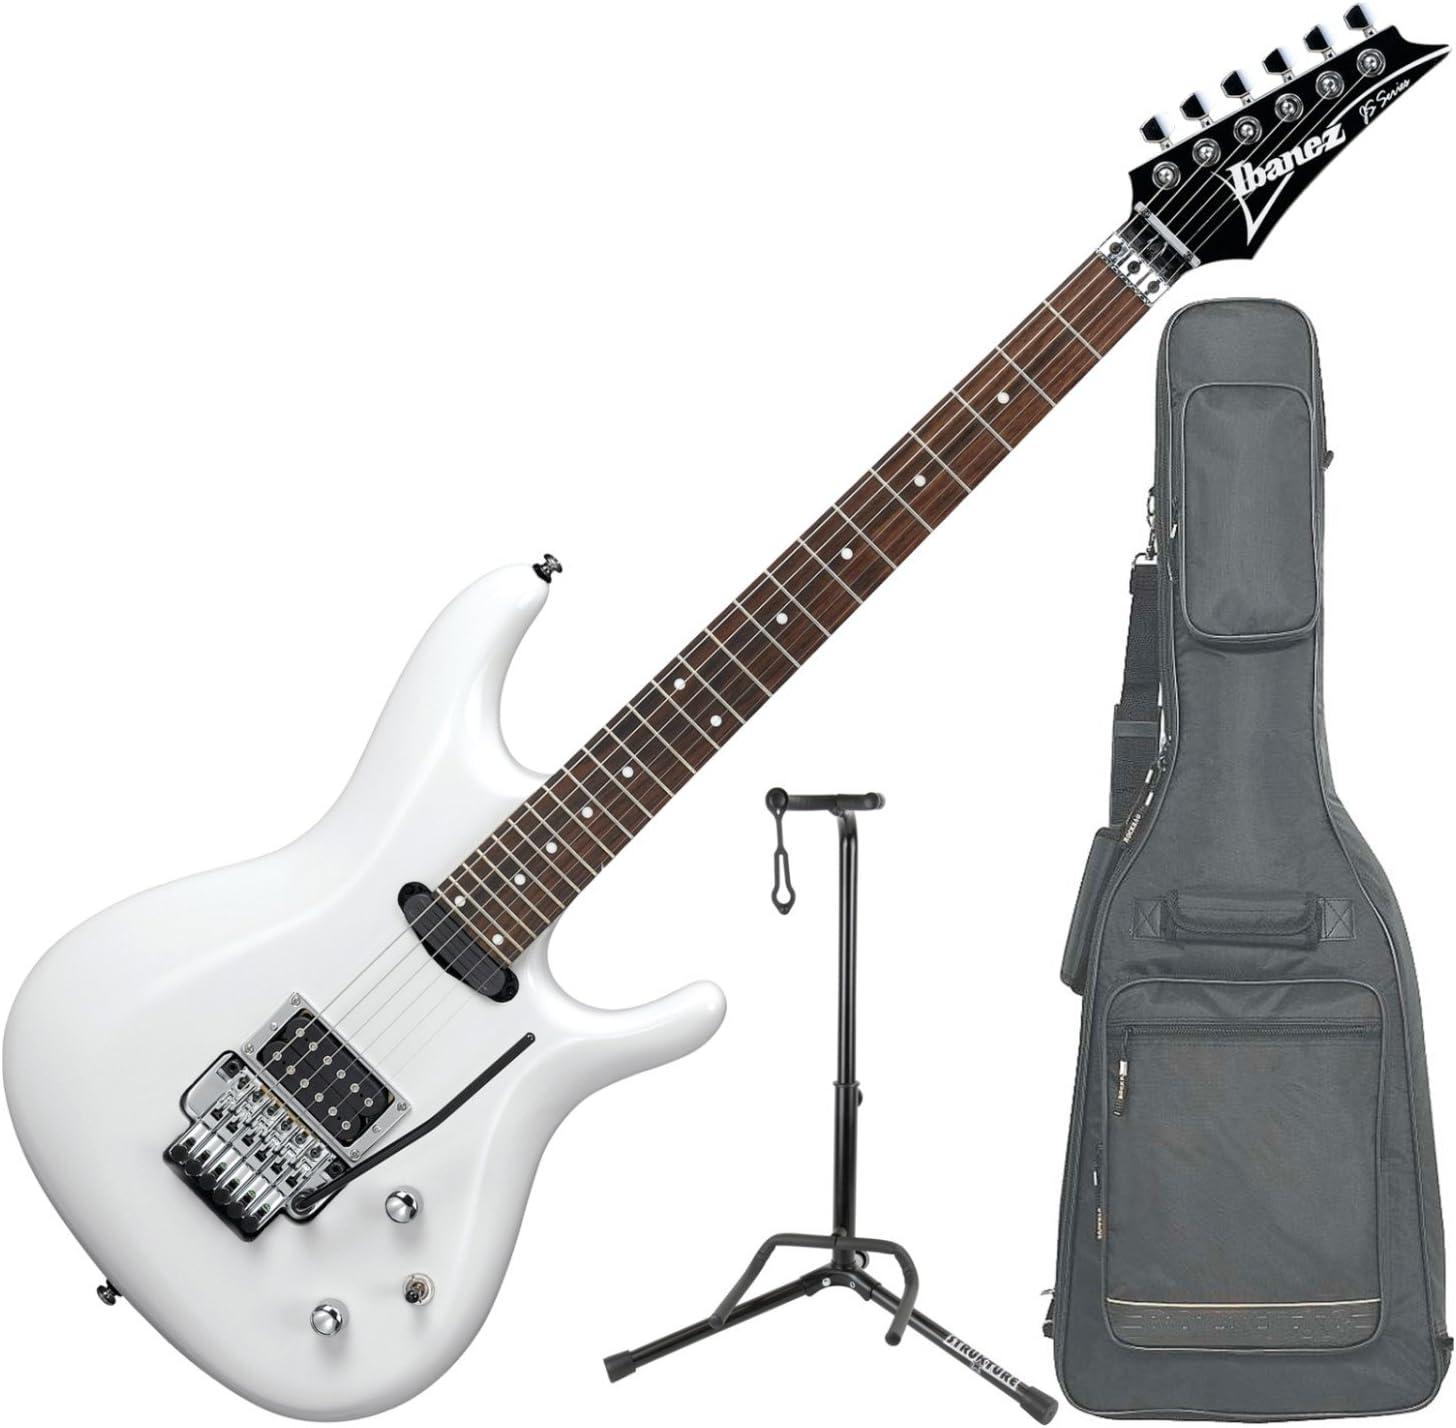 Ibanez js140 blanco Joe Satriani Signature Series guitarra ...